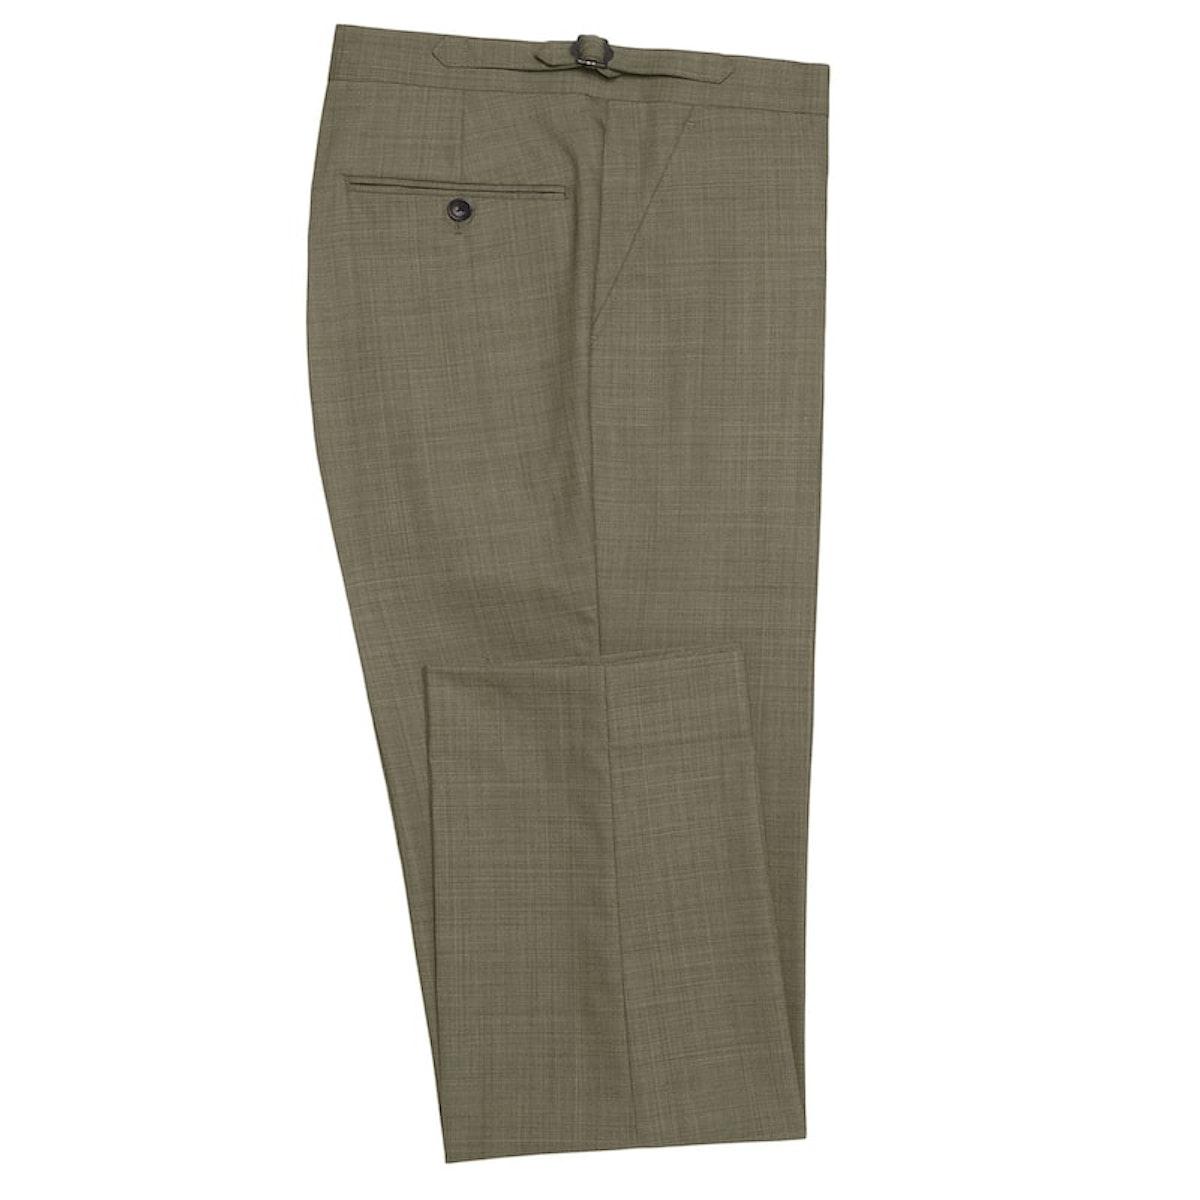 InStitchu Collection The Saltash Pants